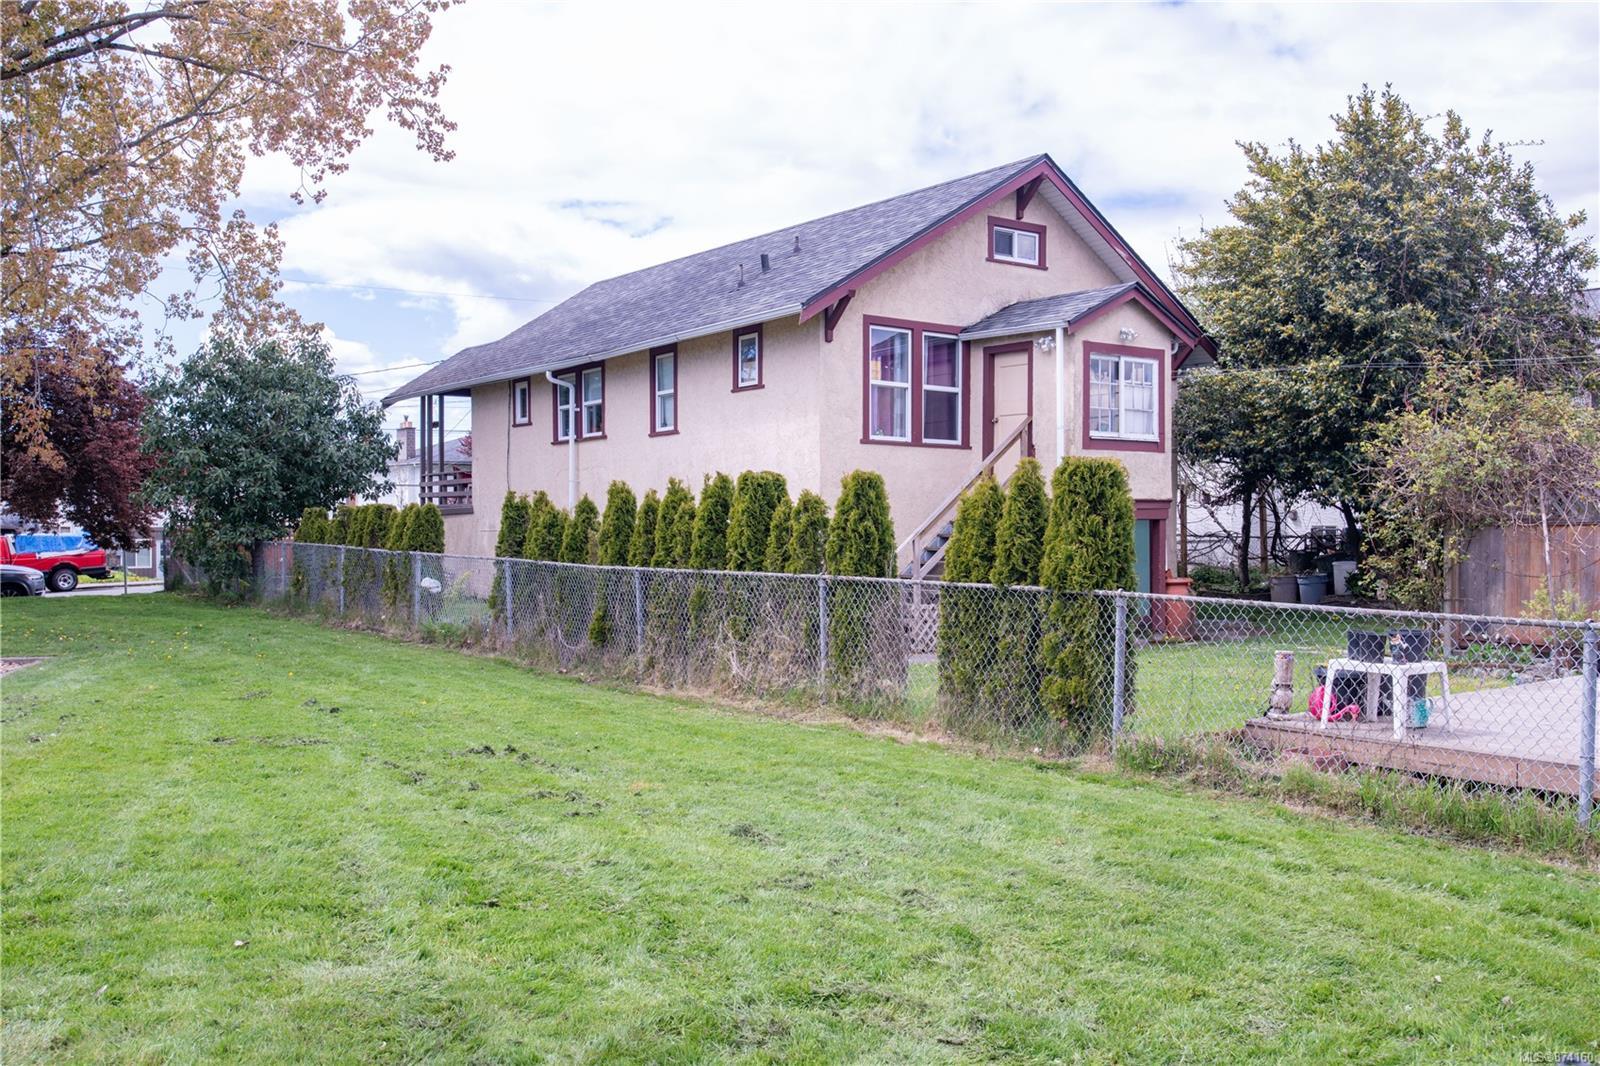 Photo 2 at 518 Sumas Street, Burnside, Victoria